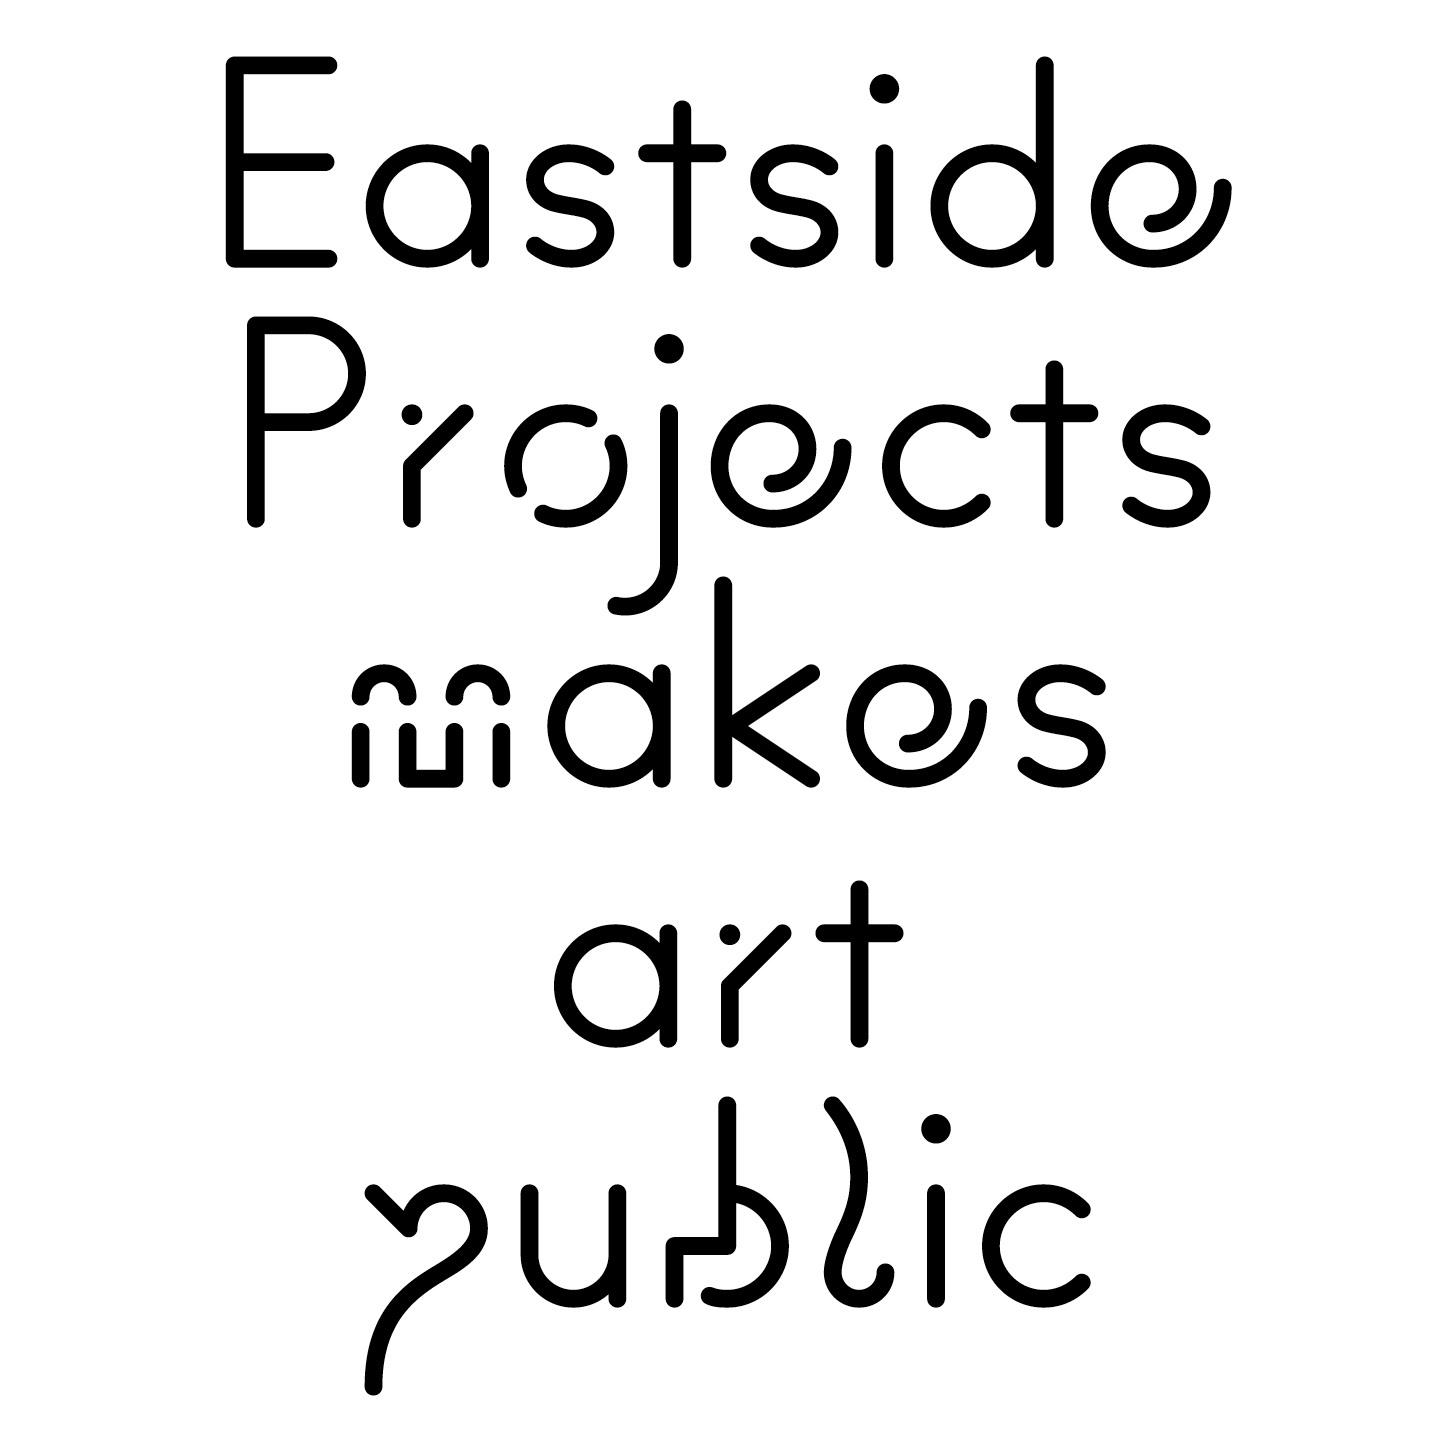 Eastside Projects